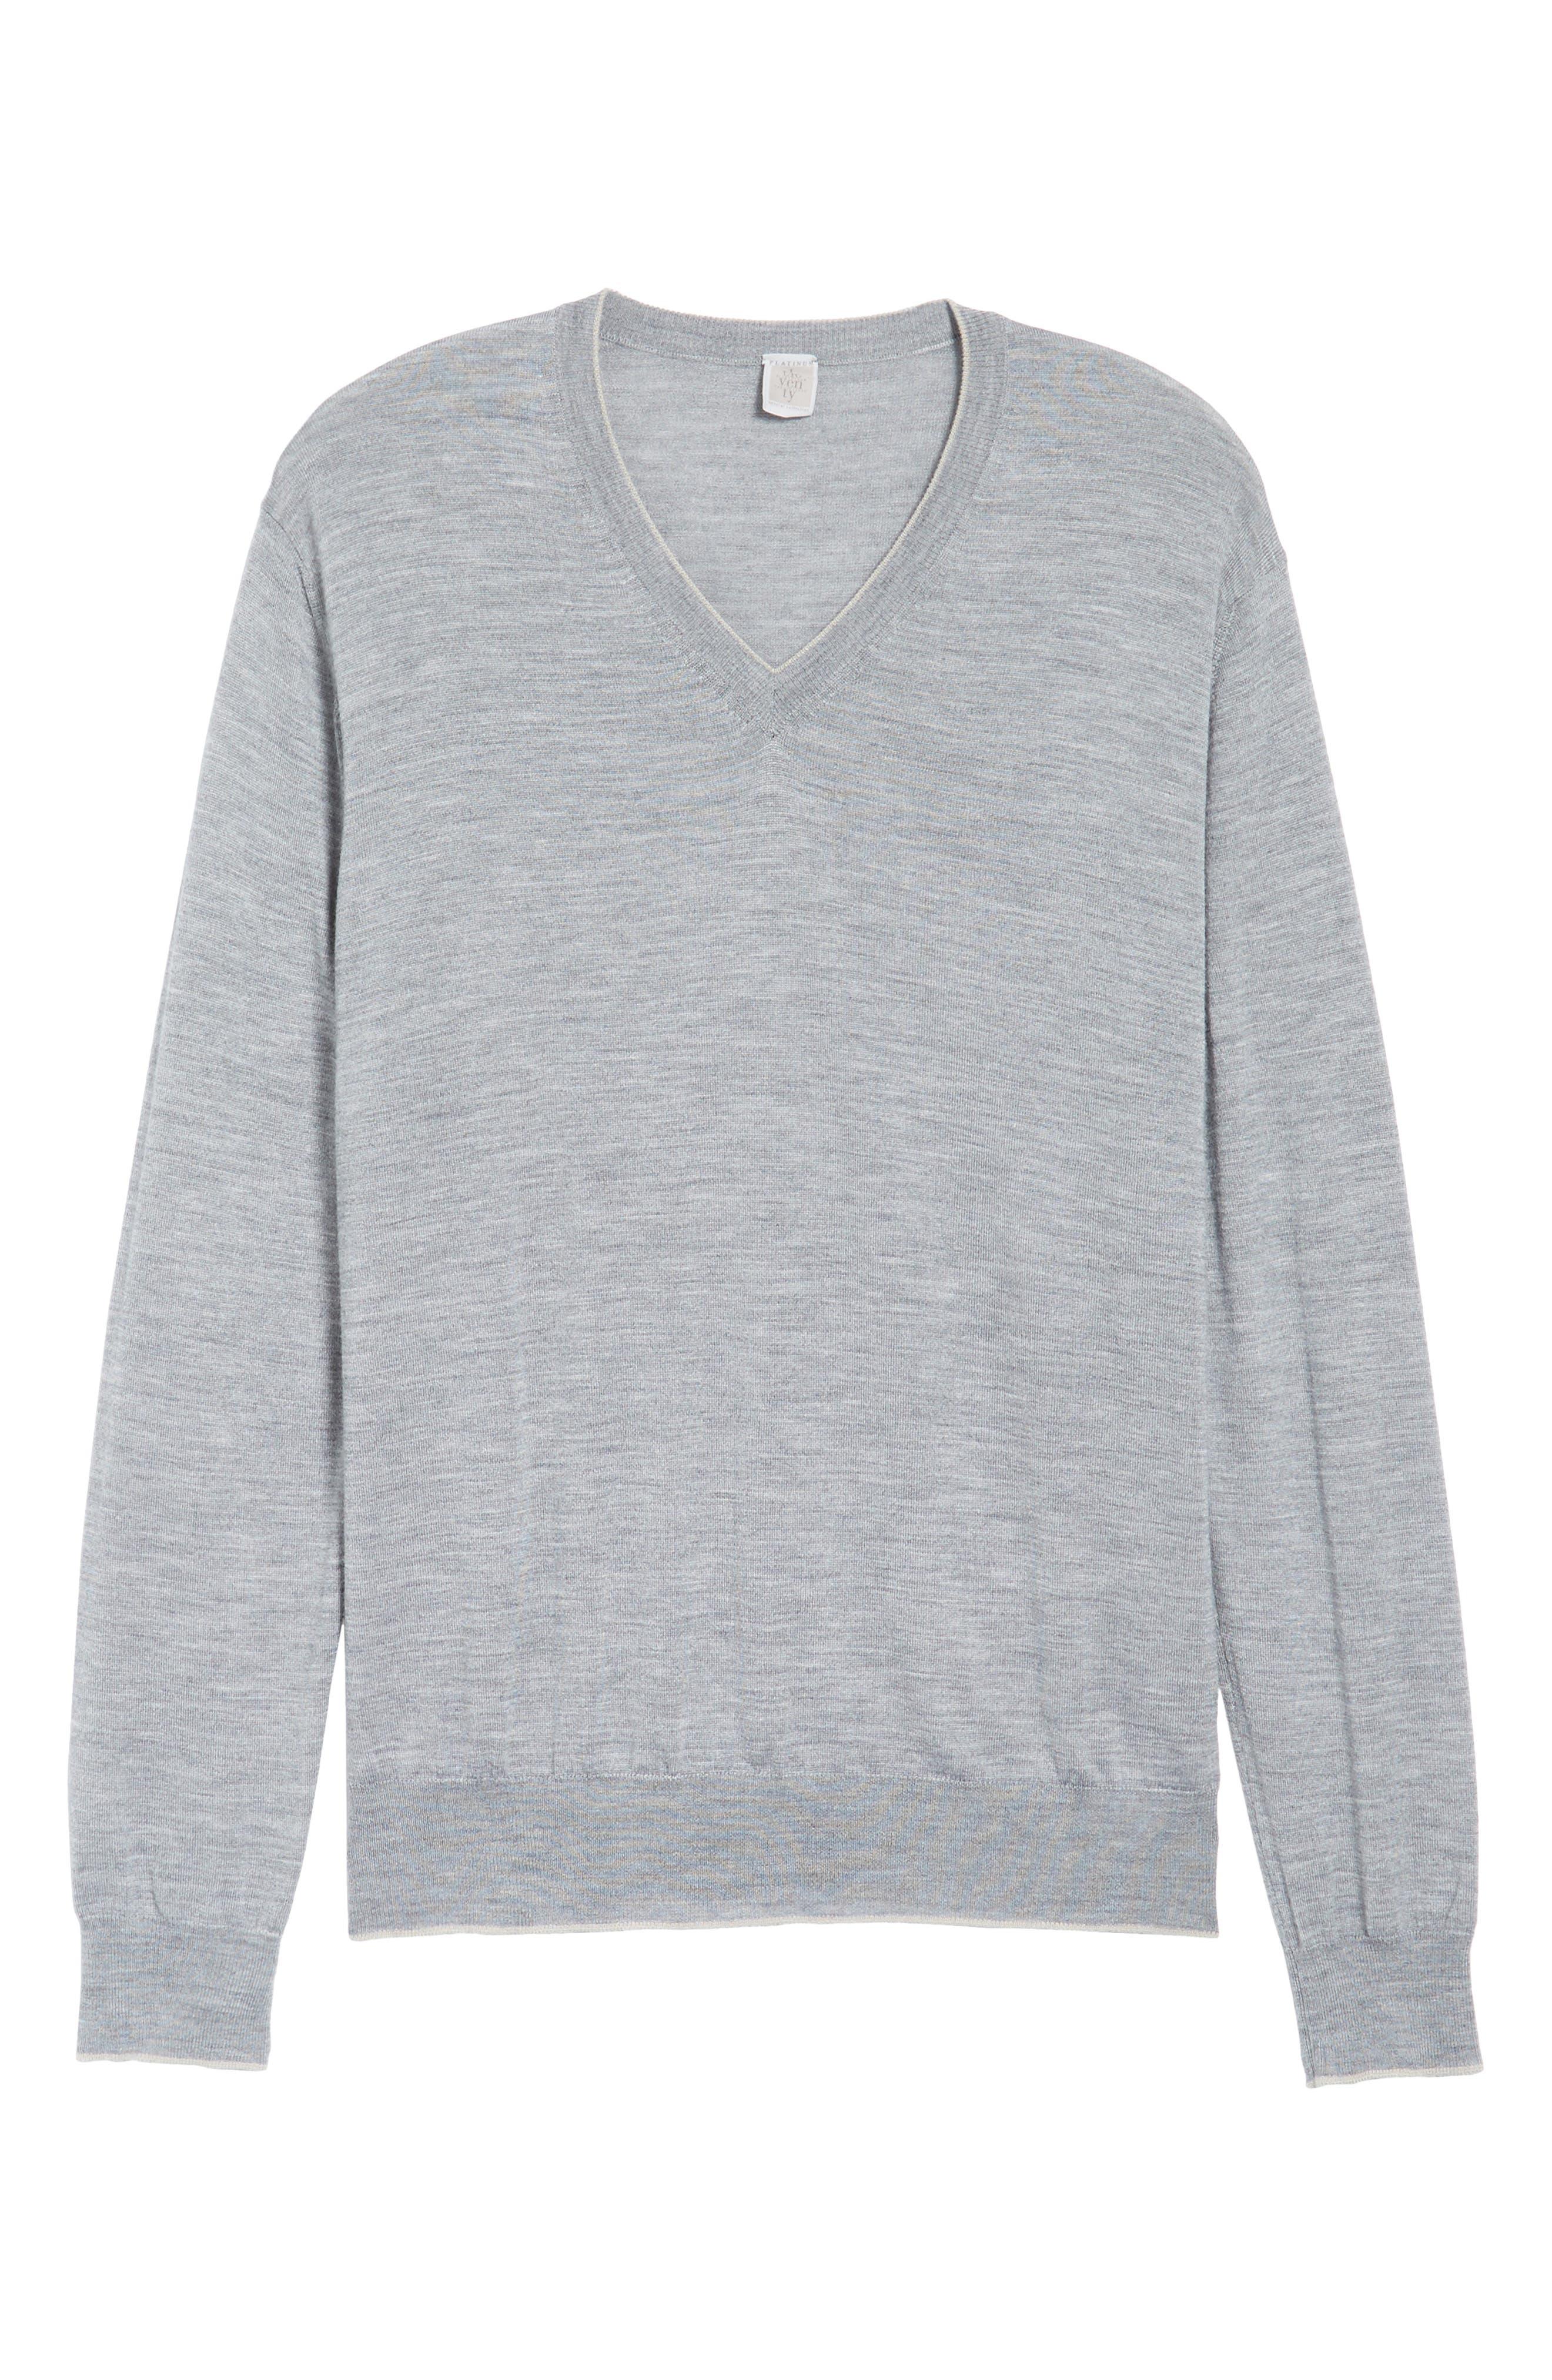 Merino Wool & Silk Tipped Sweater,                             Alternate thumbnail 6, color,                             LIGHT GREY